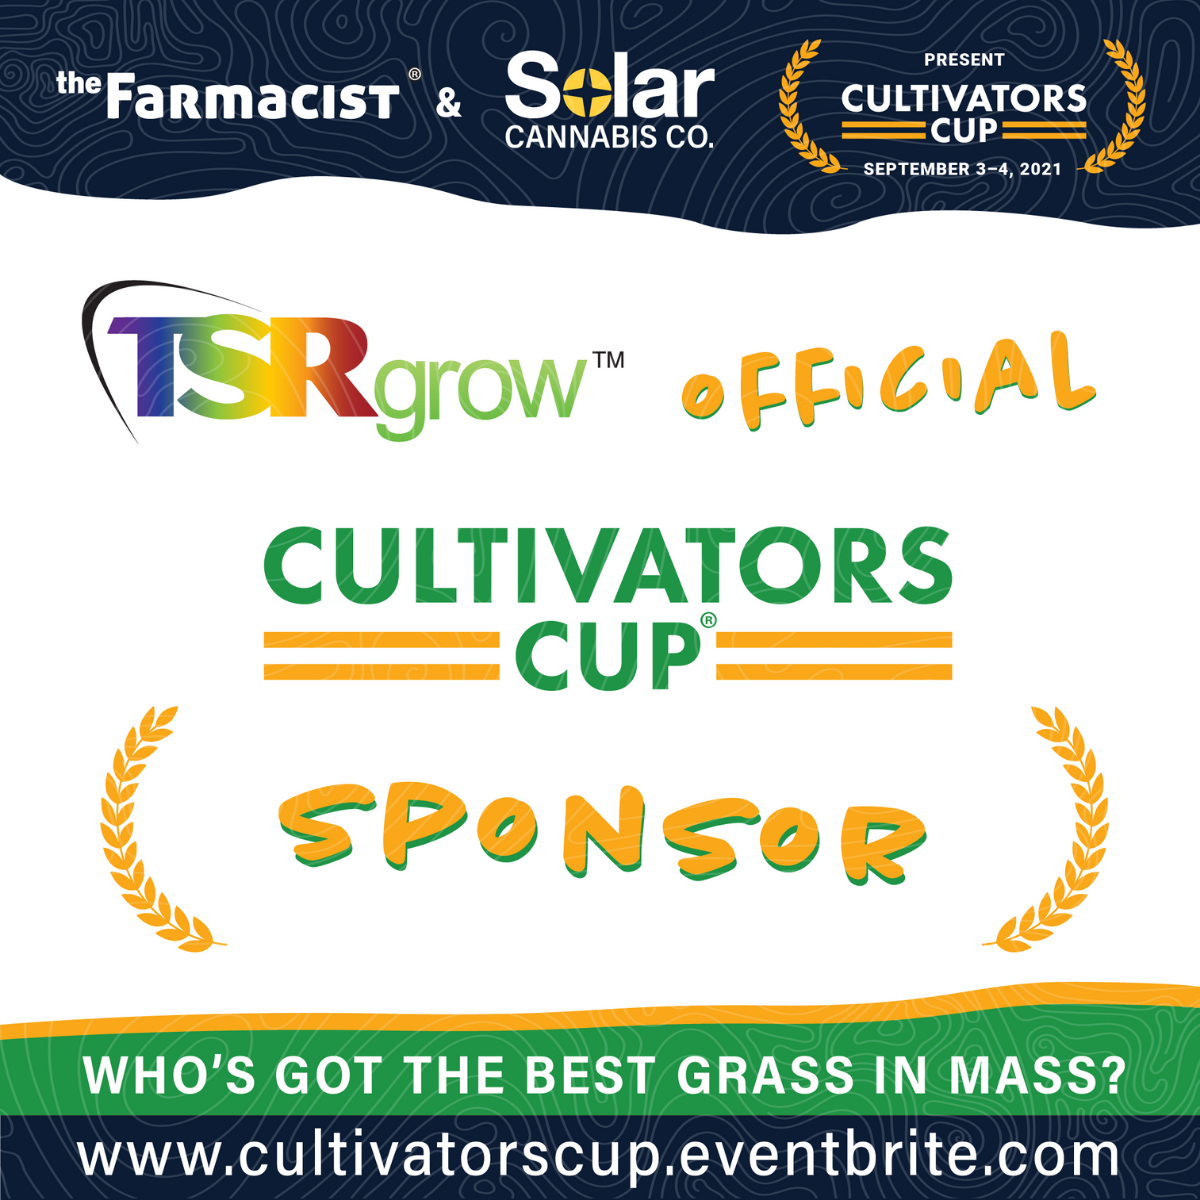 cultivators cup sponsor